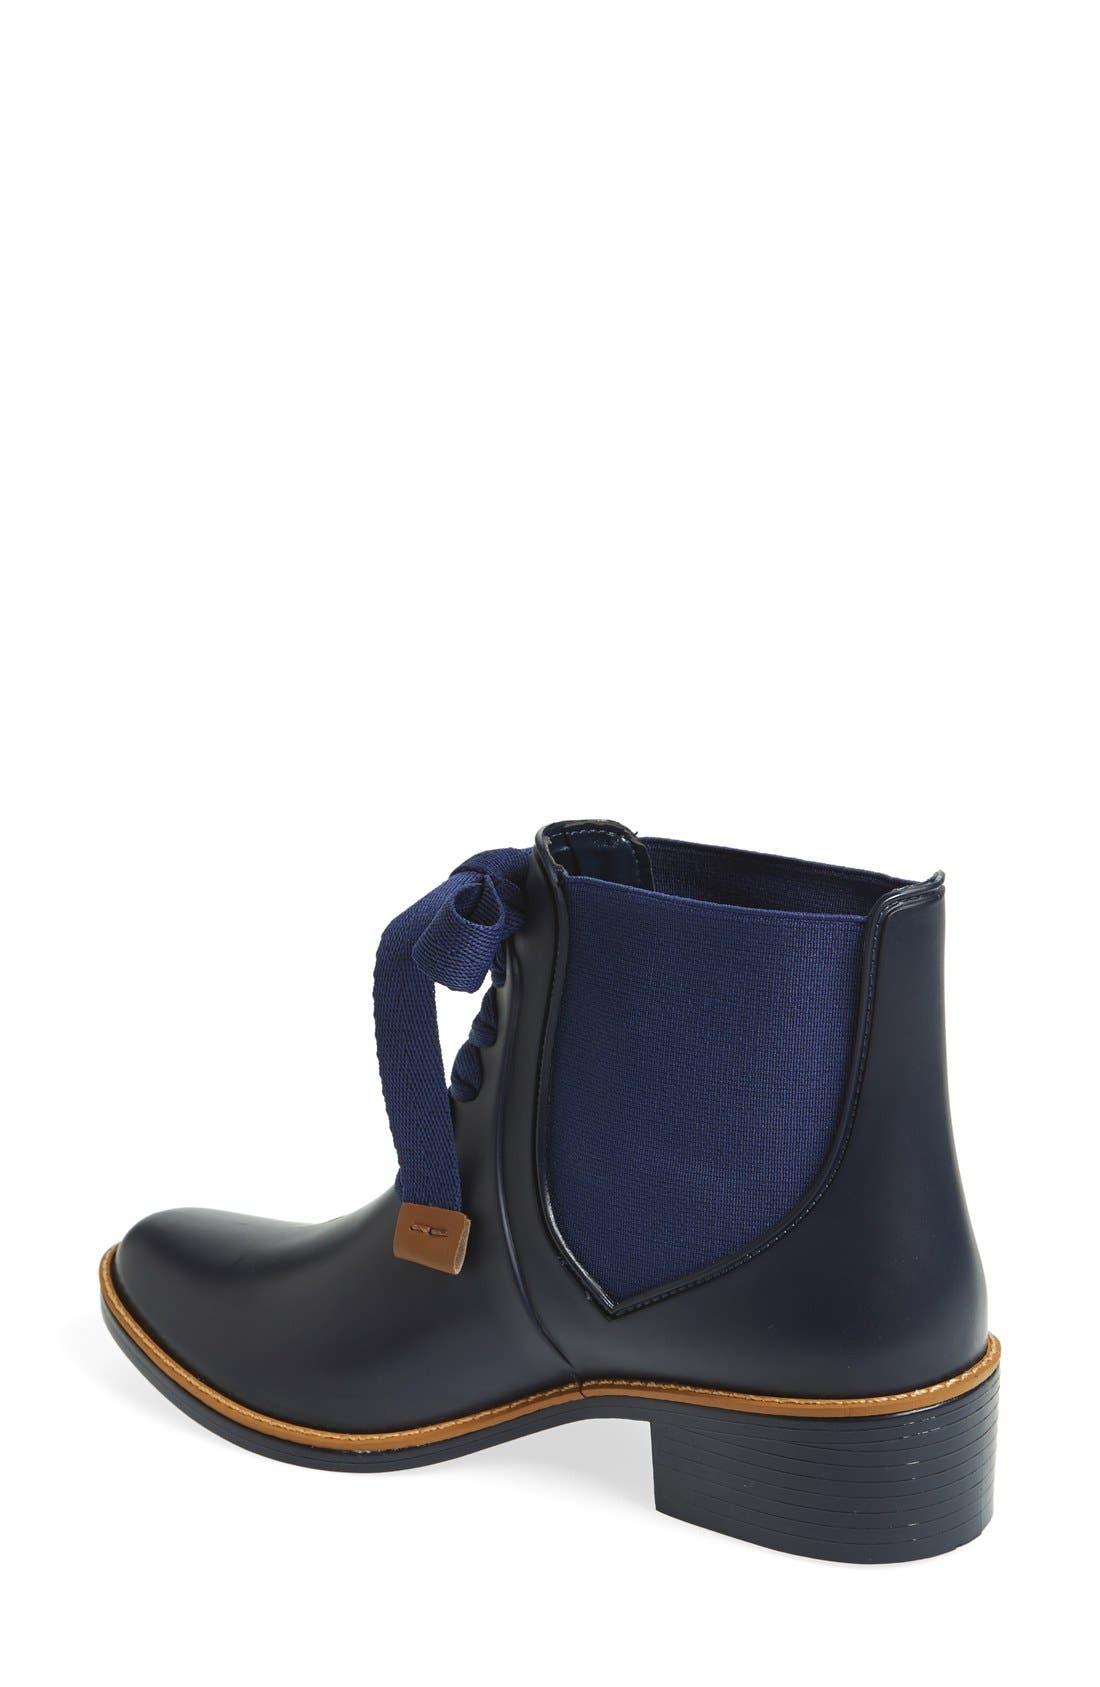 Alternate Image 3  - Bernardo Lacey Short Waterproof Rain Boot (Women)